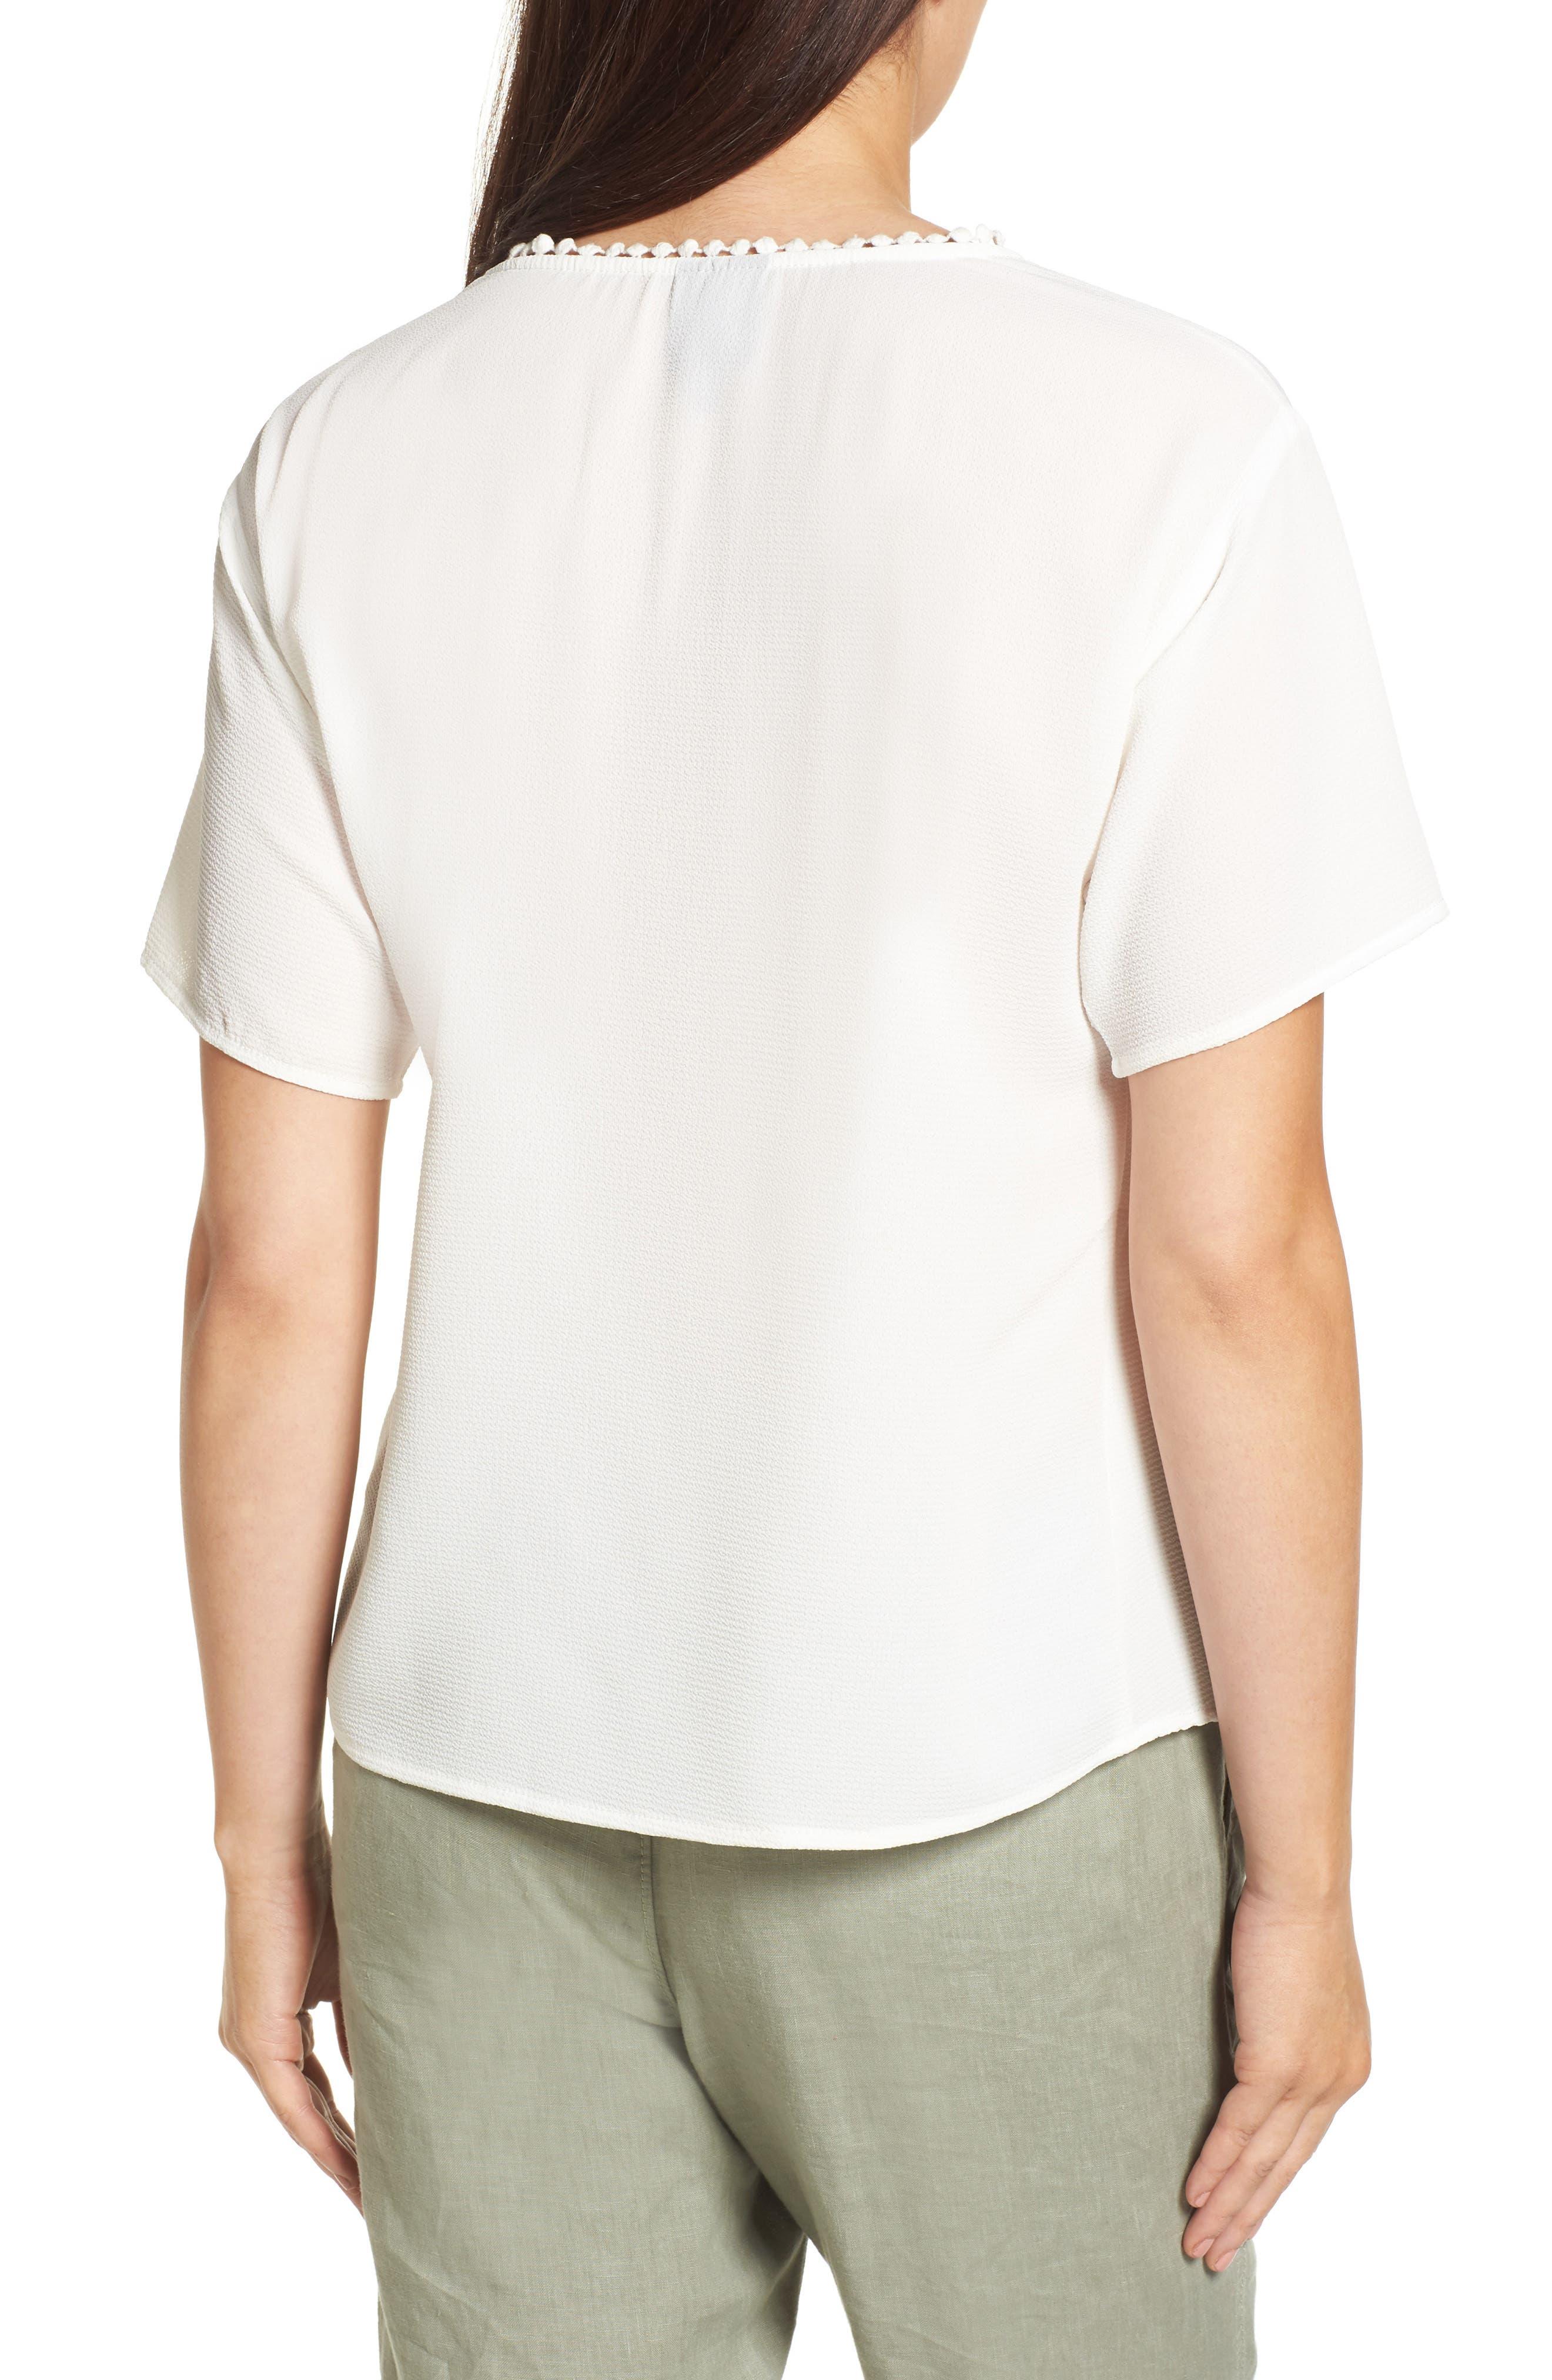 Alternate Image 2  - Bobeau Stretch Crepe Top (Regular & Petite)